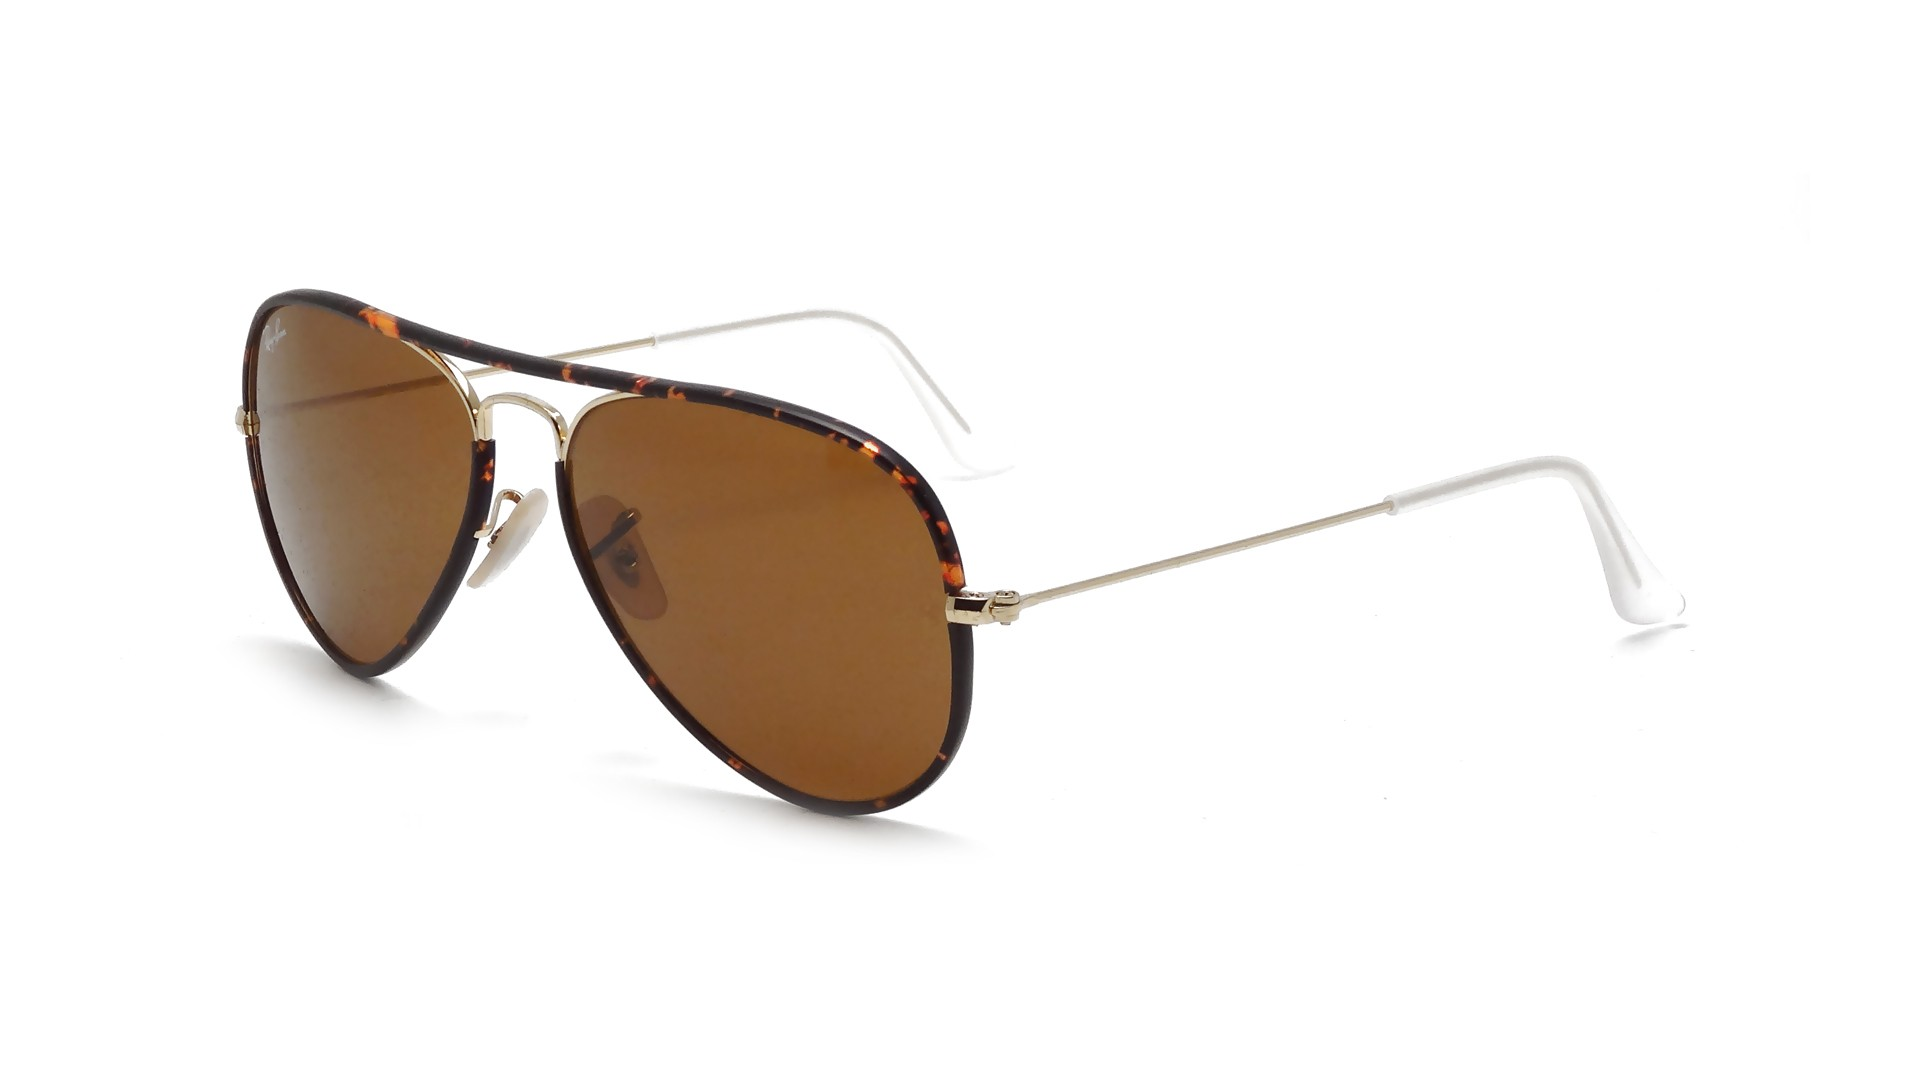 Ray Ban Tortoise Aviator Sunglasses  ban aviator full color tortoise rb3025jm 001 58 14 visiofactory